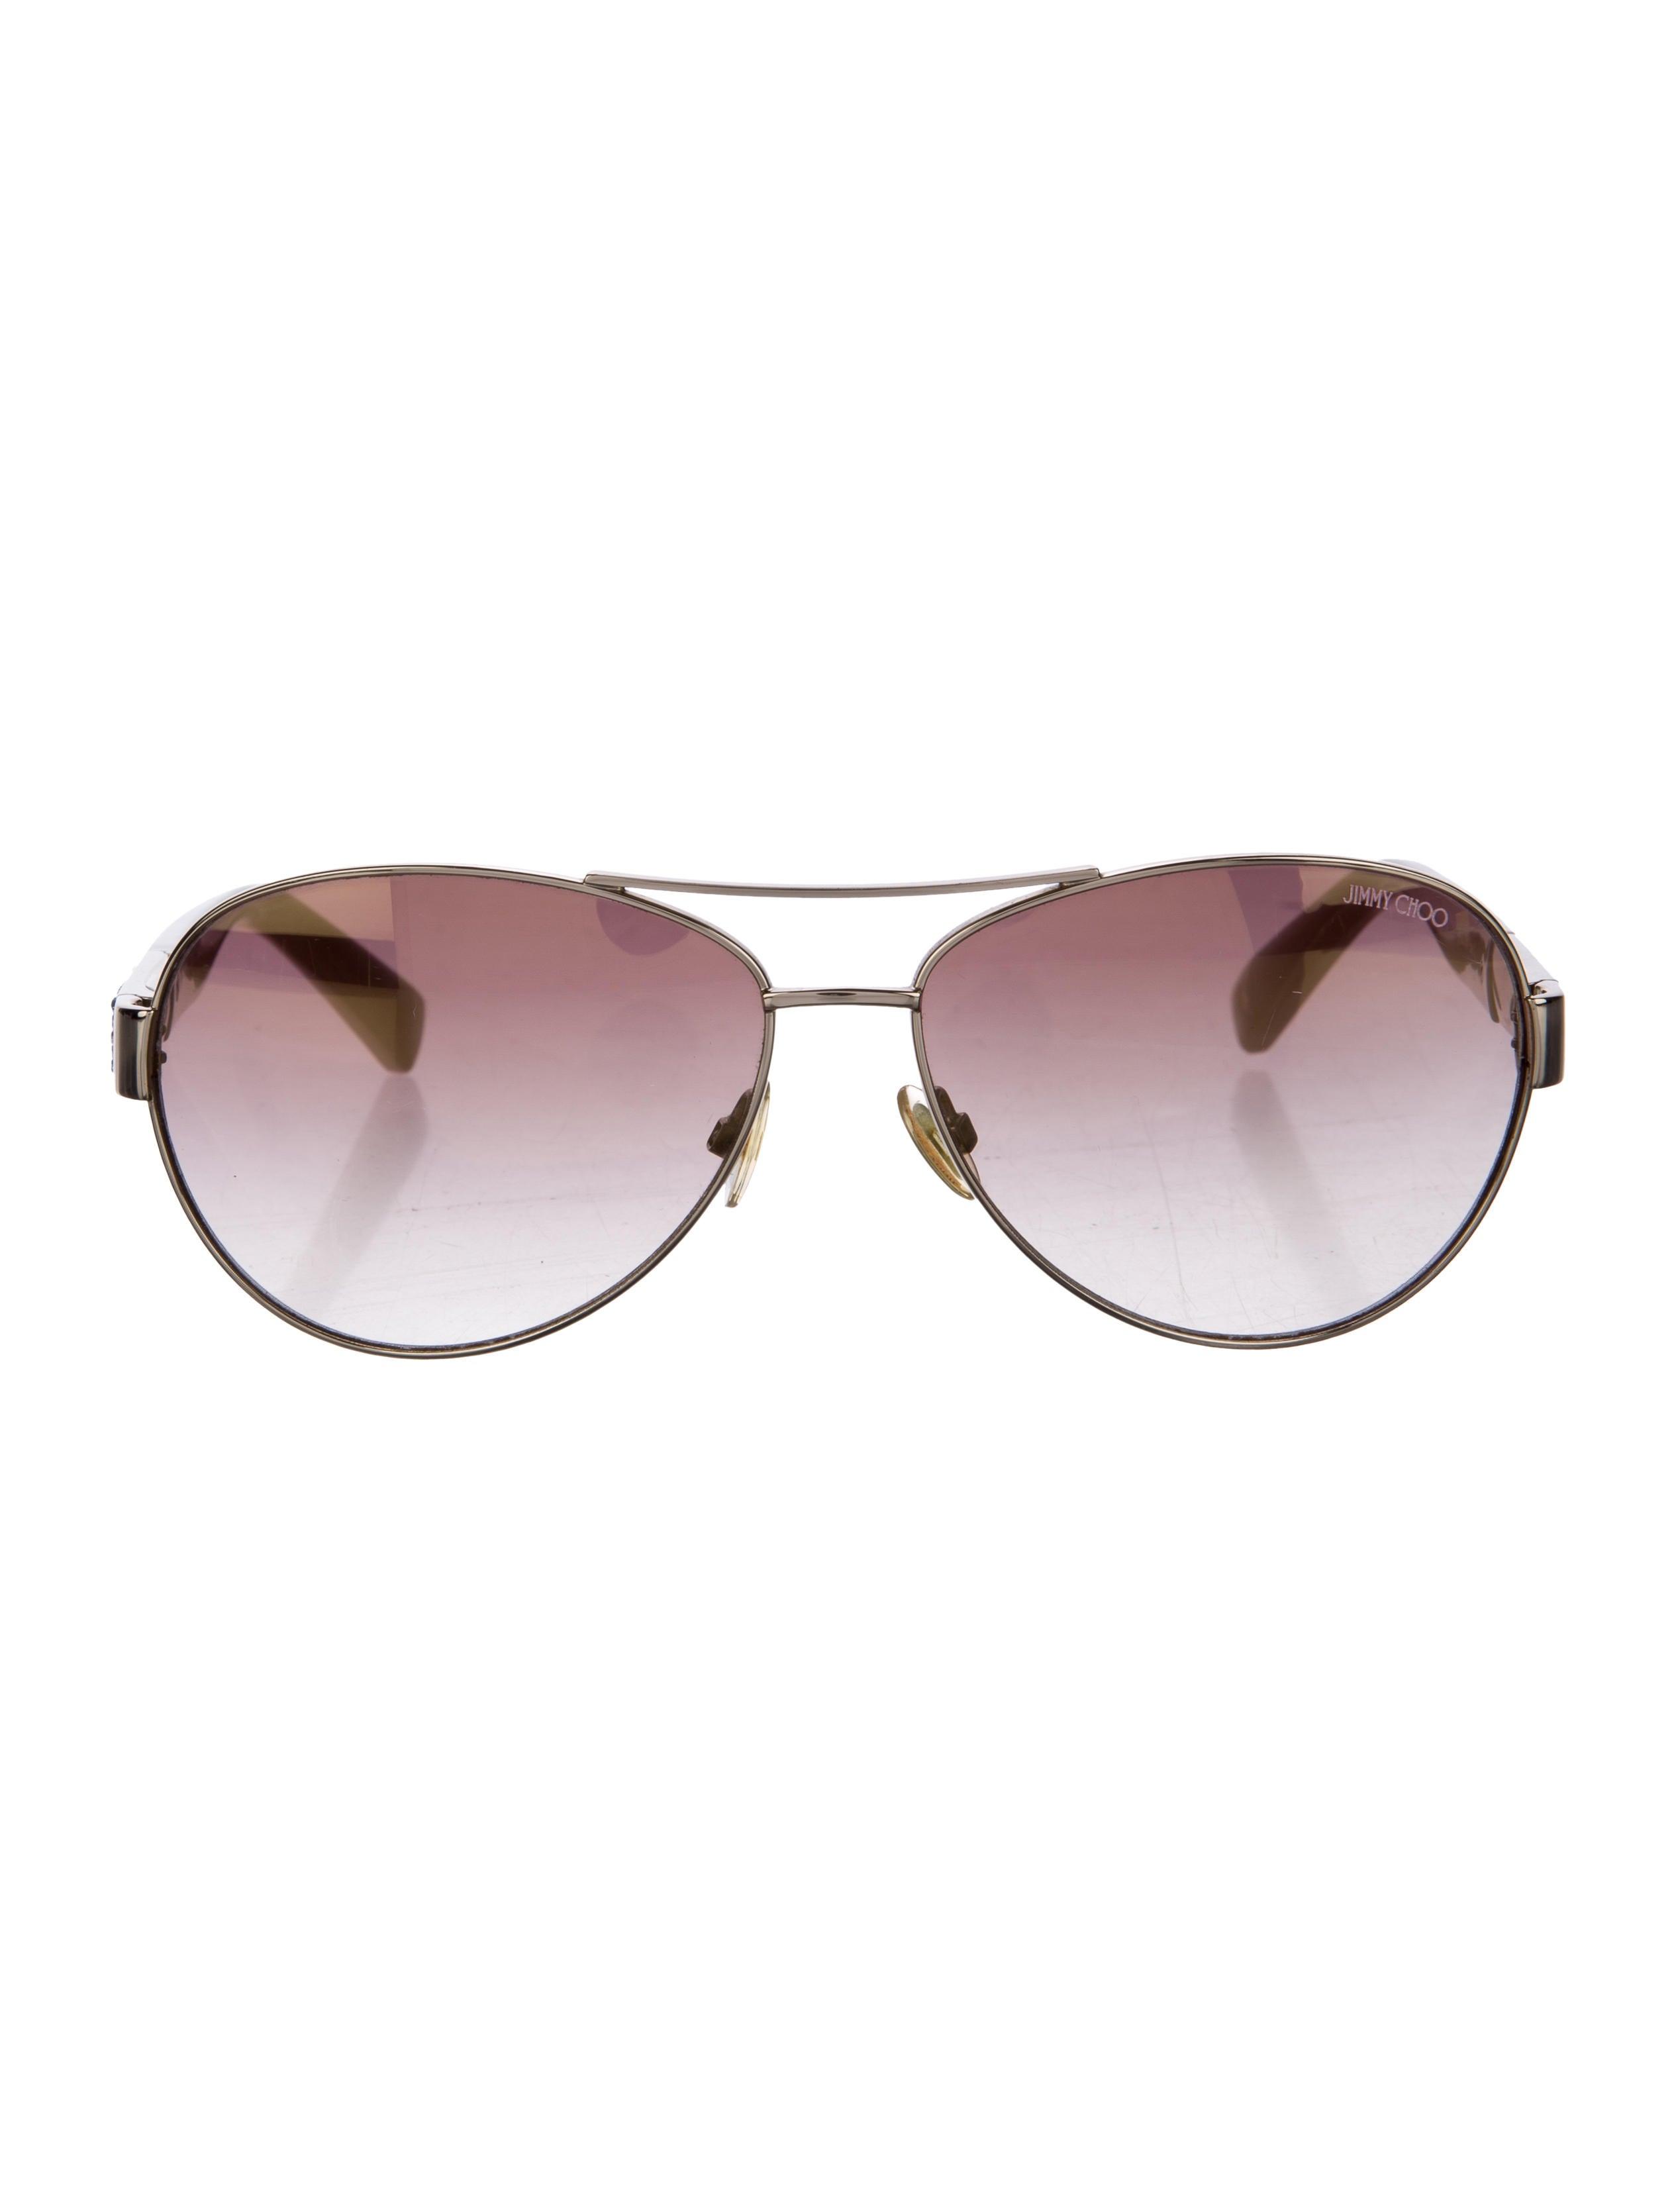 ae44875159d2b Jimmy Choo Baba Aviator Sunglasses - Accessories - JIM64757